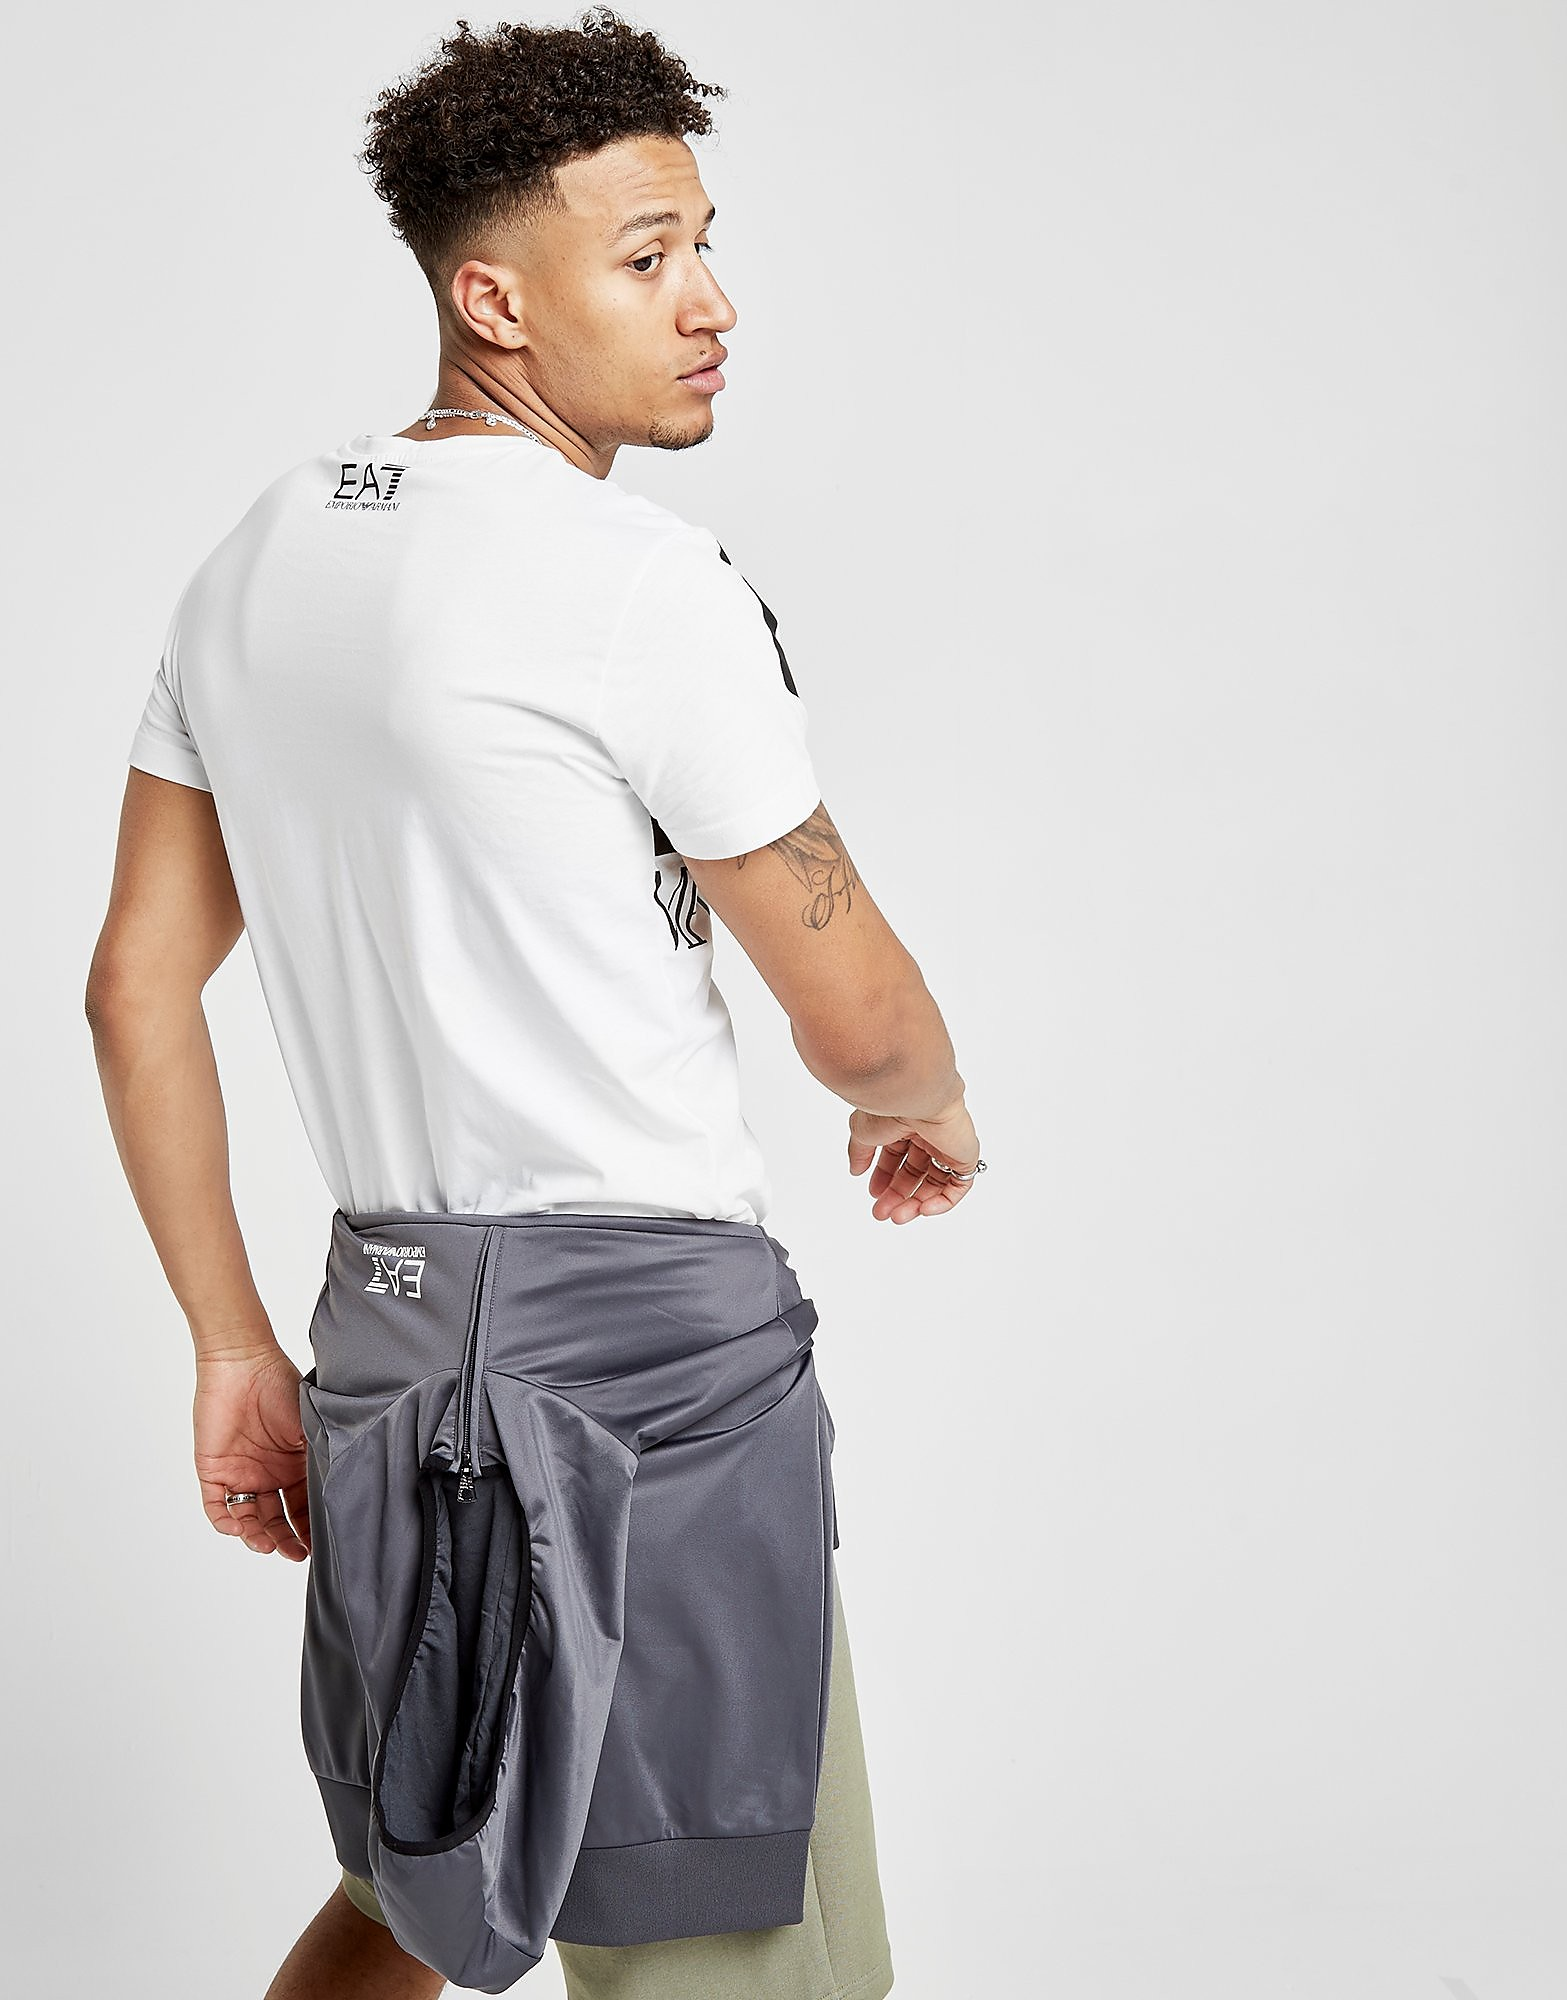 Emporio Armani EA7 Large All Over Brand T-Shirt